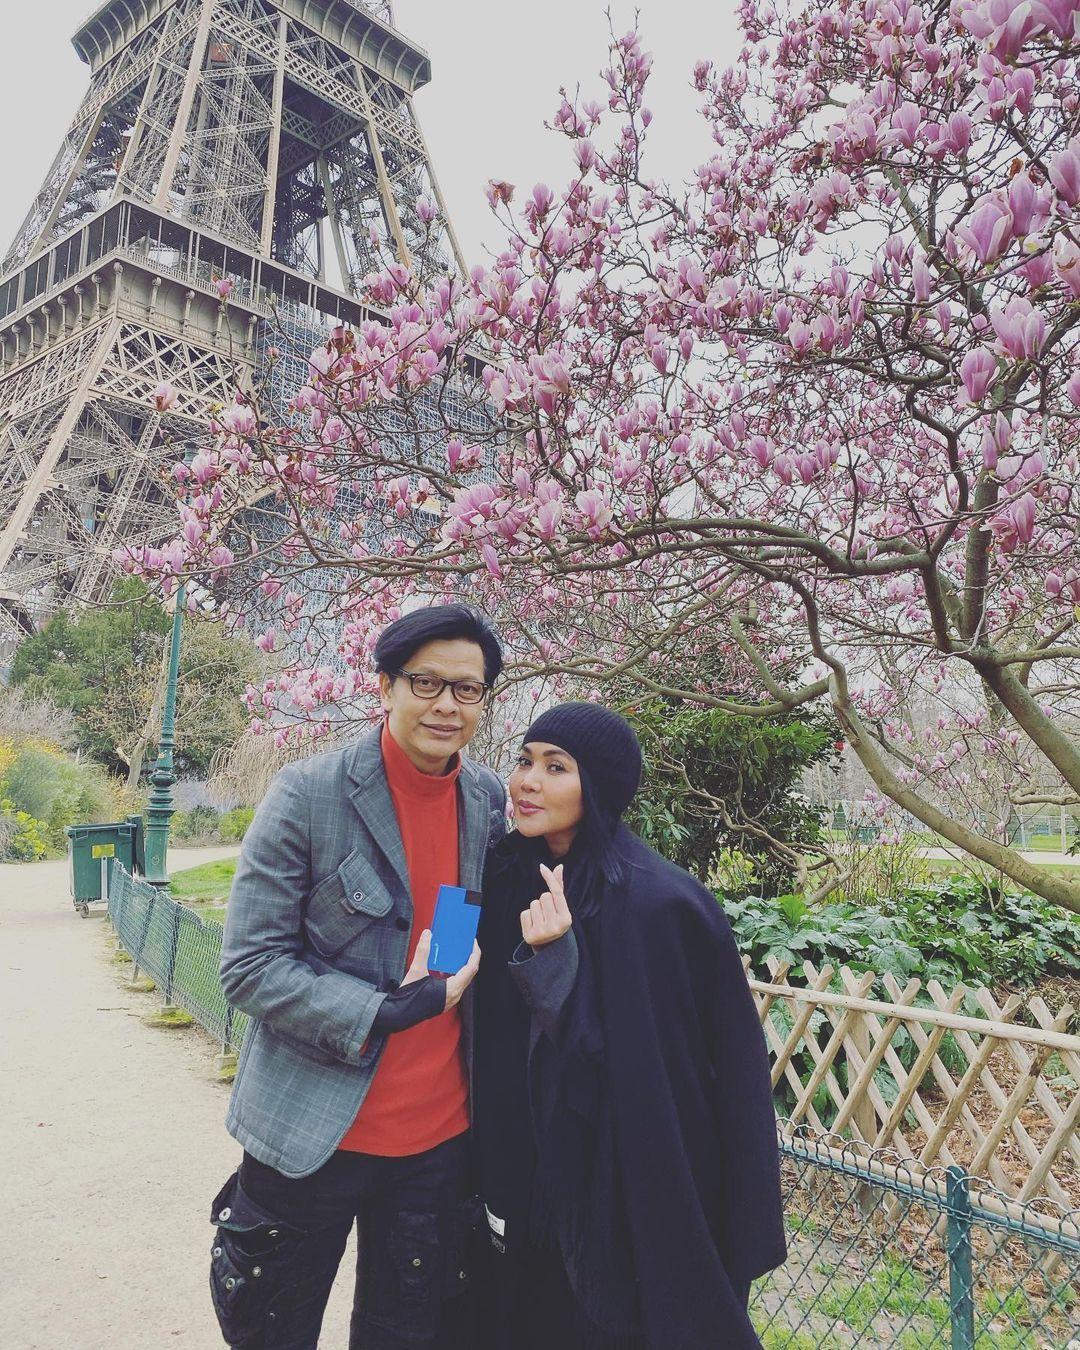 7 Gaya Pasangan Artis Indonesia yang Kompak dan Hidup Bahagia